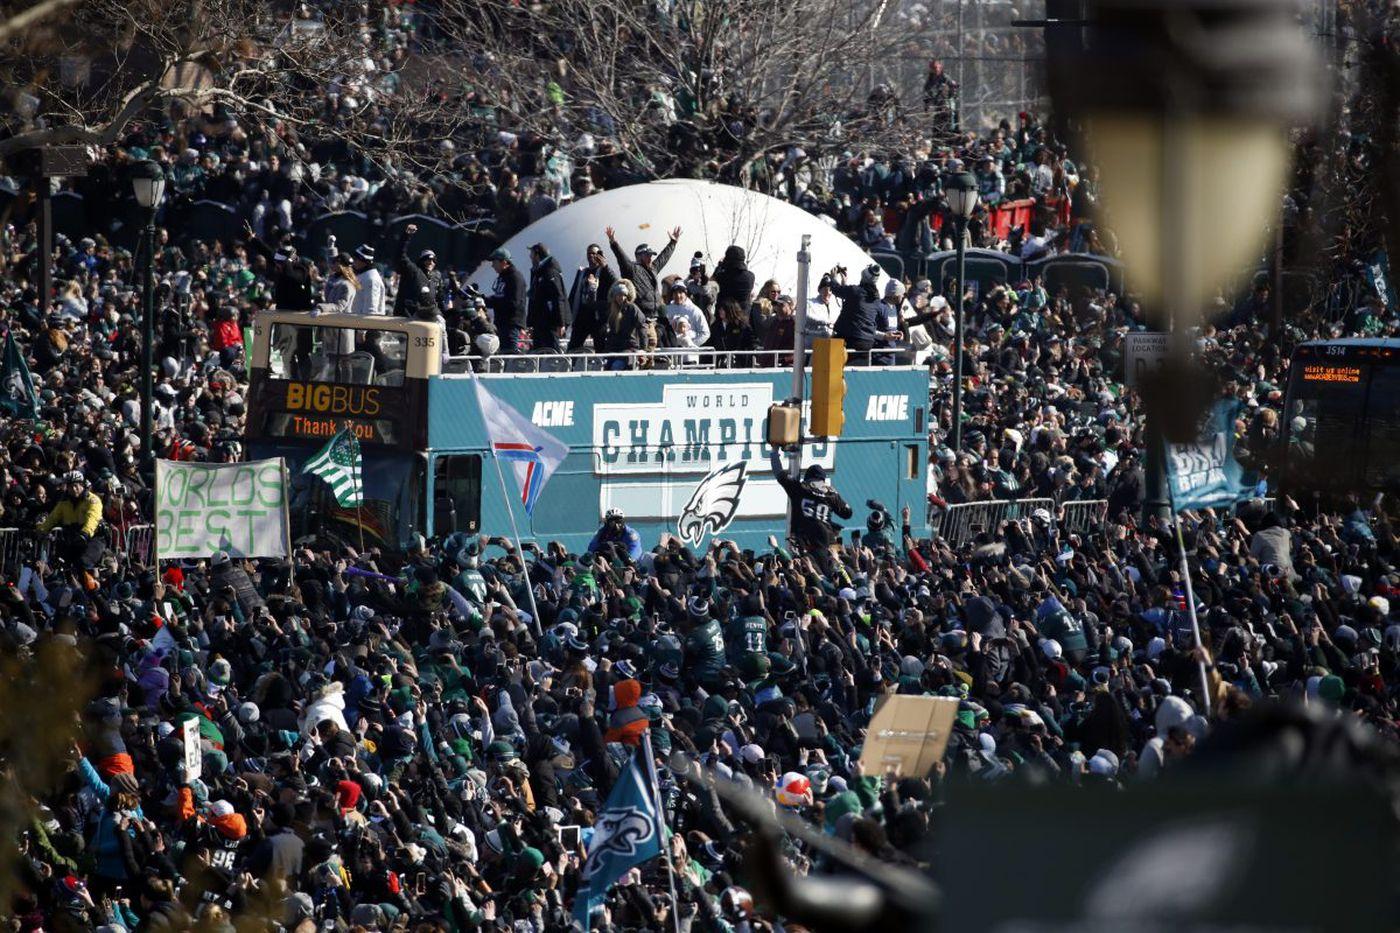 Will Thursday's Super Bowl parade make the flu spread?